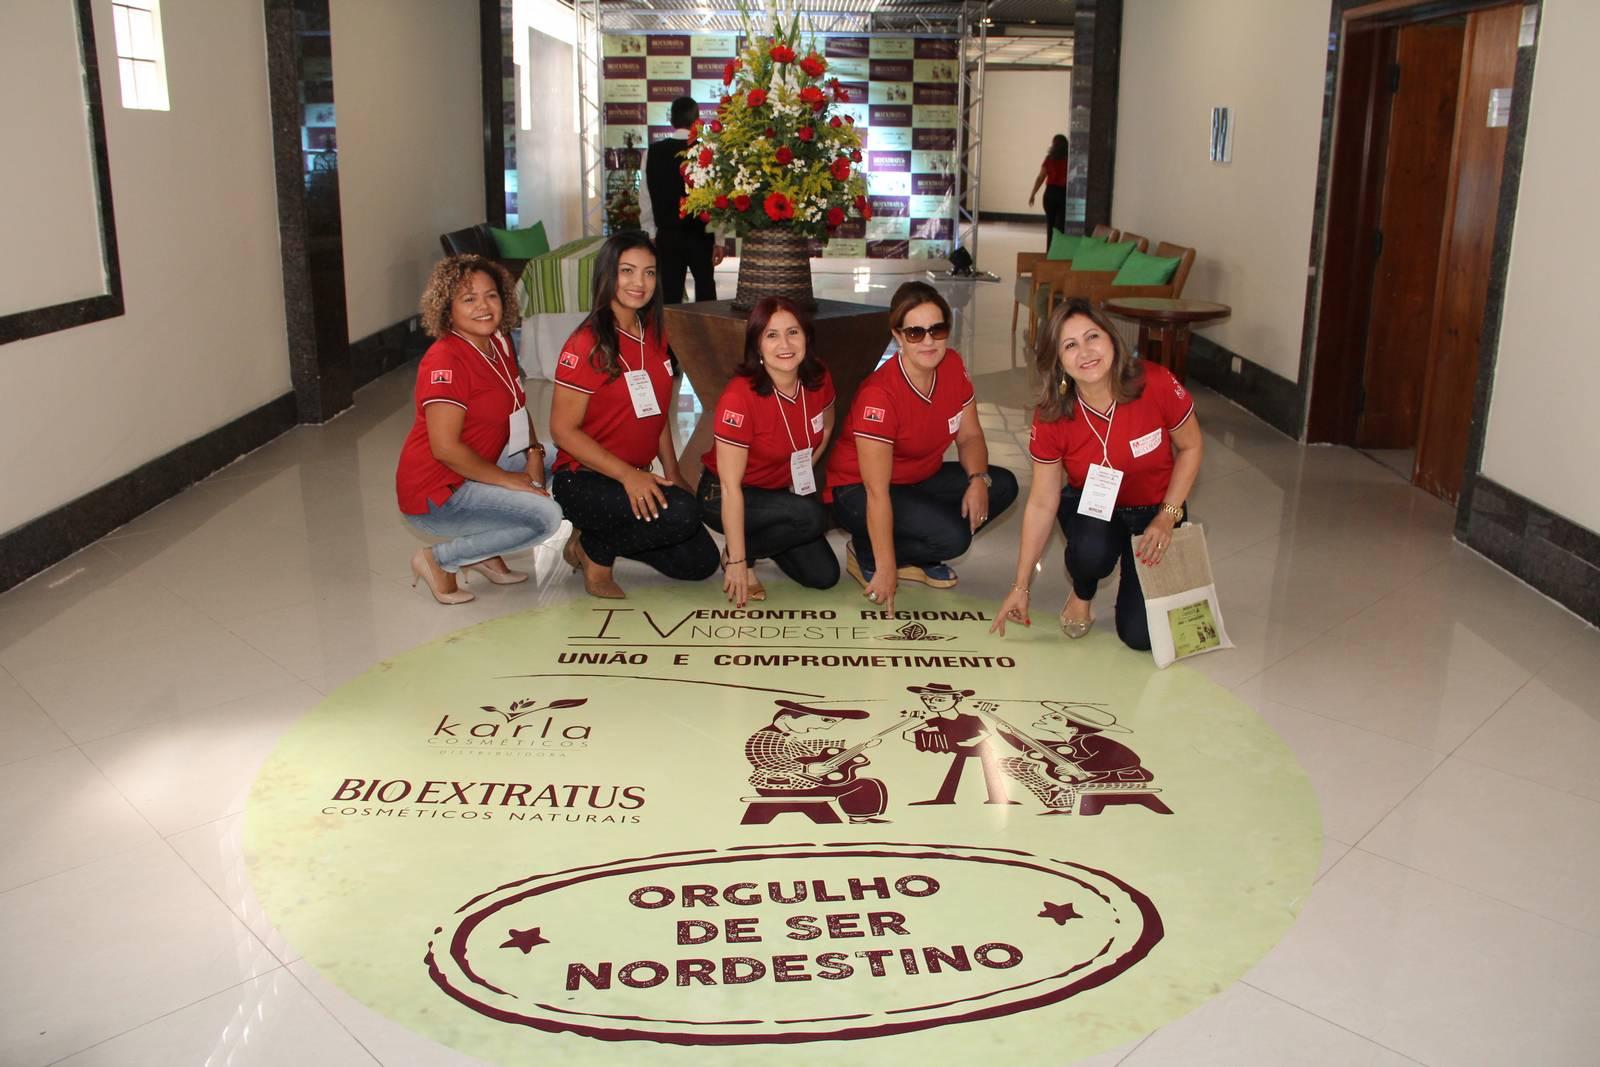 IV Encontro Regional do Nordeste - Bio Extratus (40)